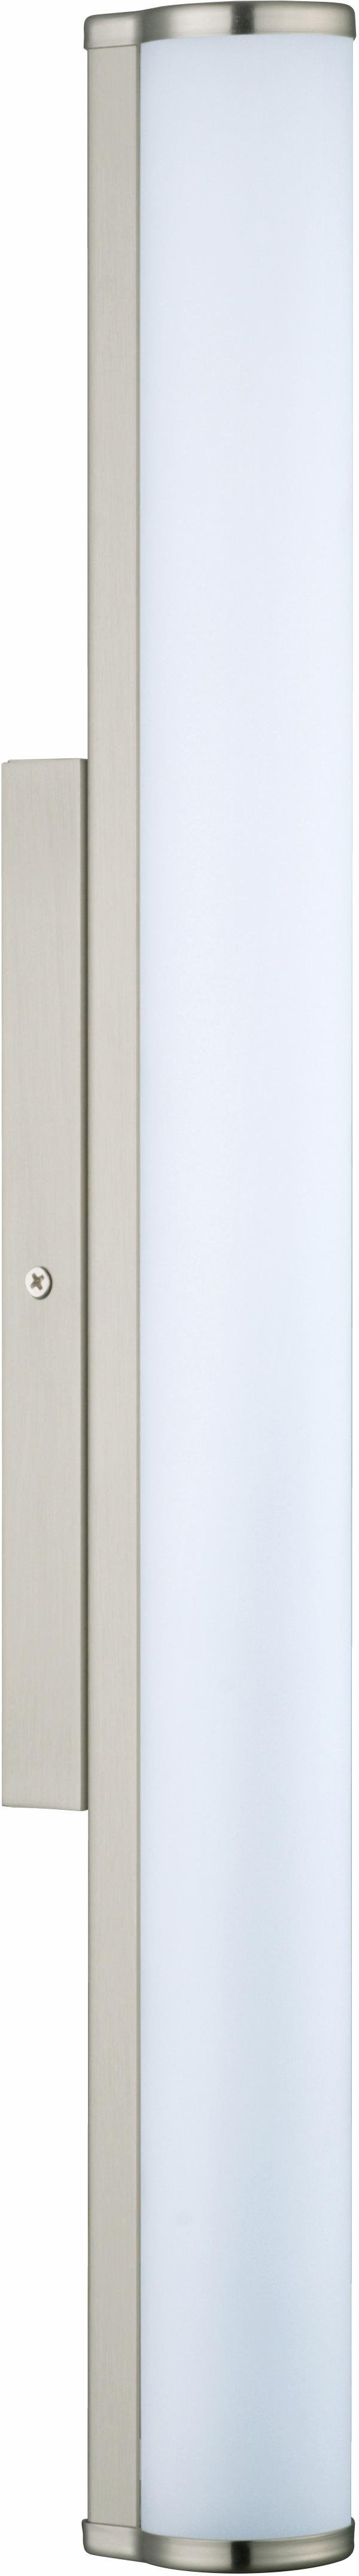 EGLO led-wandlamp »CALNOVA«, online kopen op otto.nl